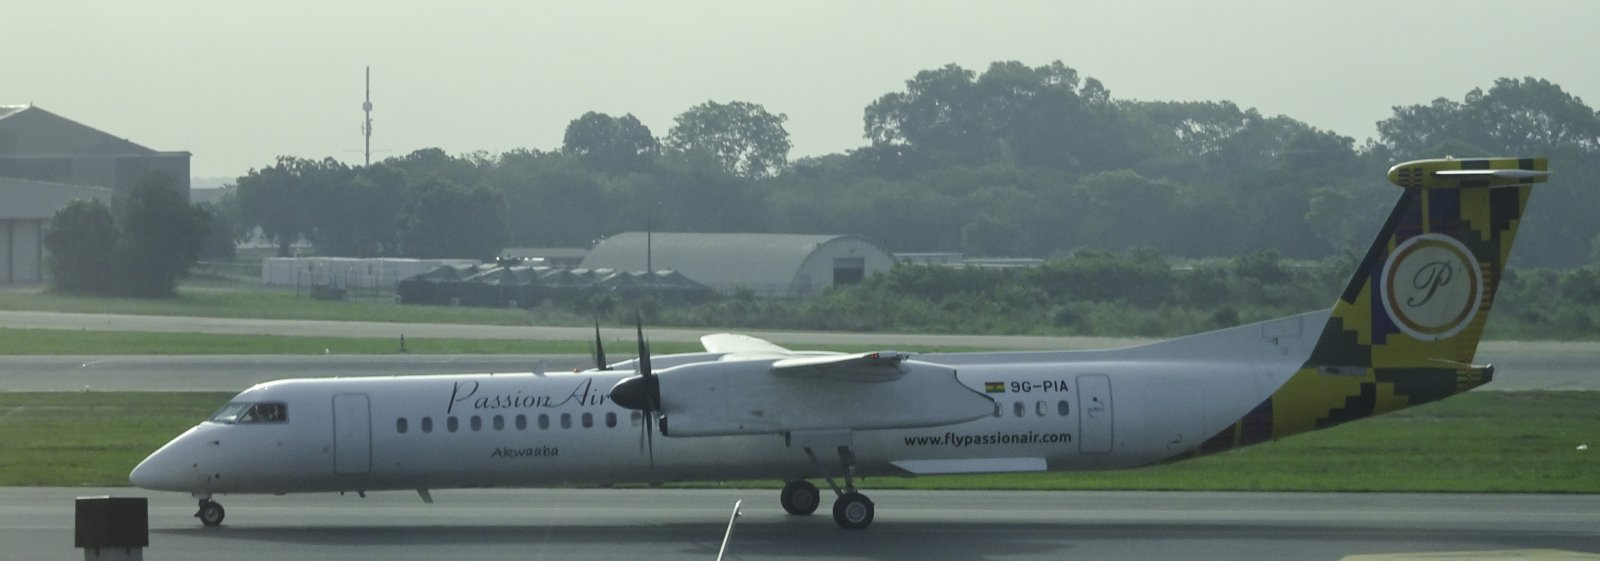 Passion Air Dash DHC-8 9G-PIA